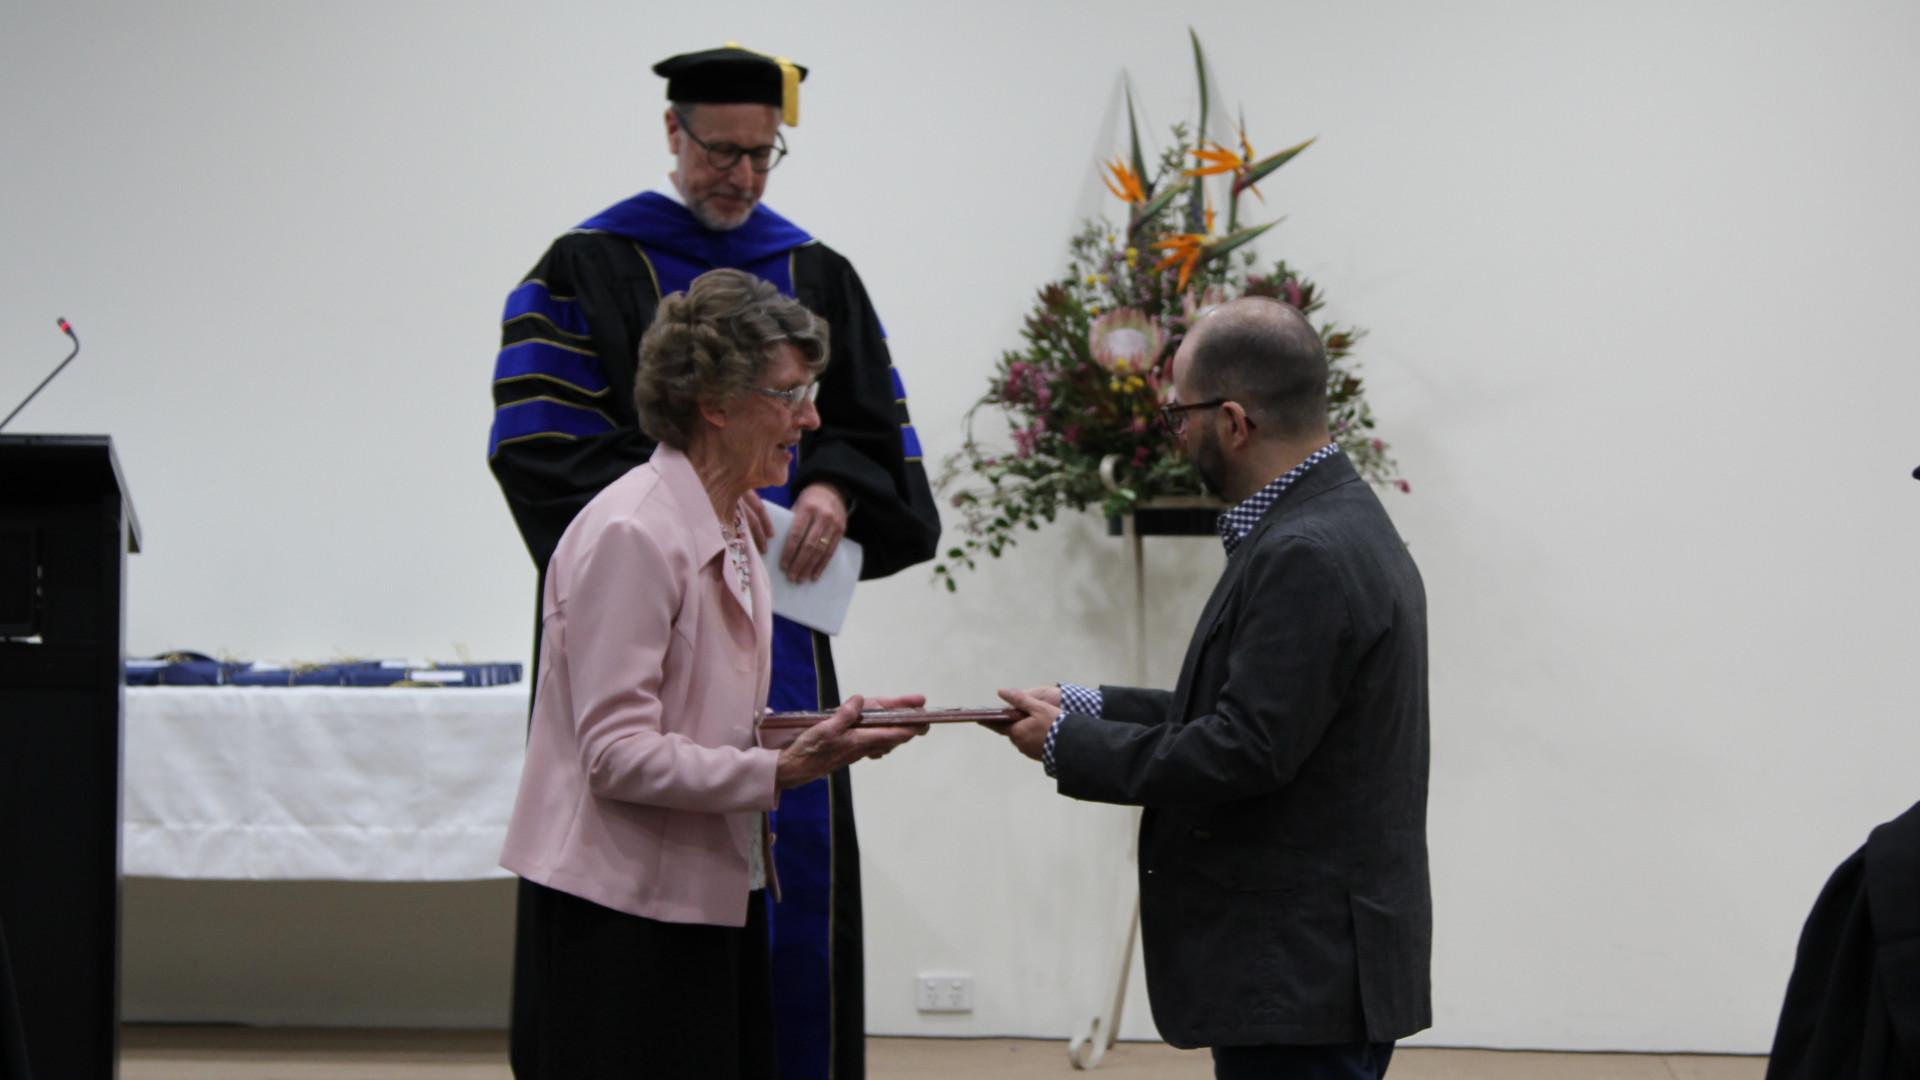 Andrew Grace receiving award from Margaret Rickard